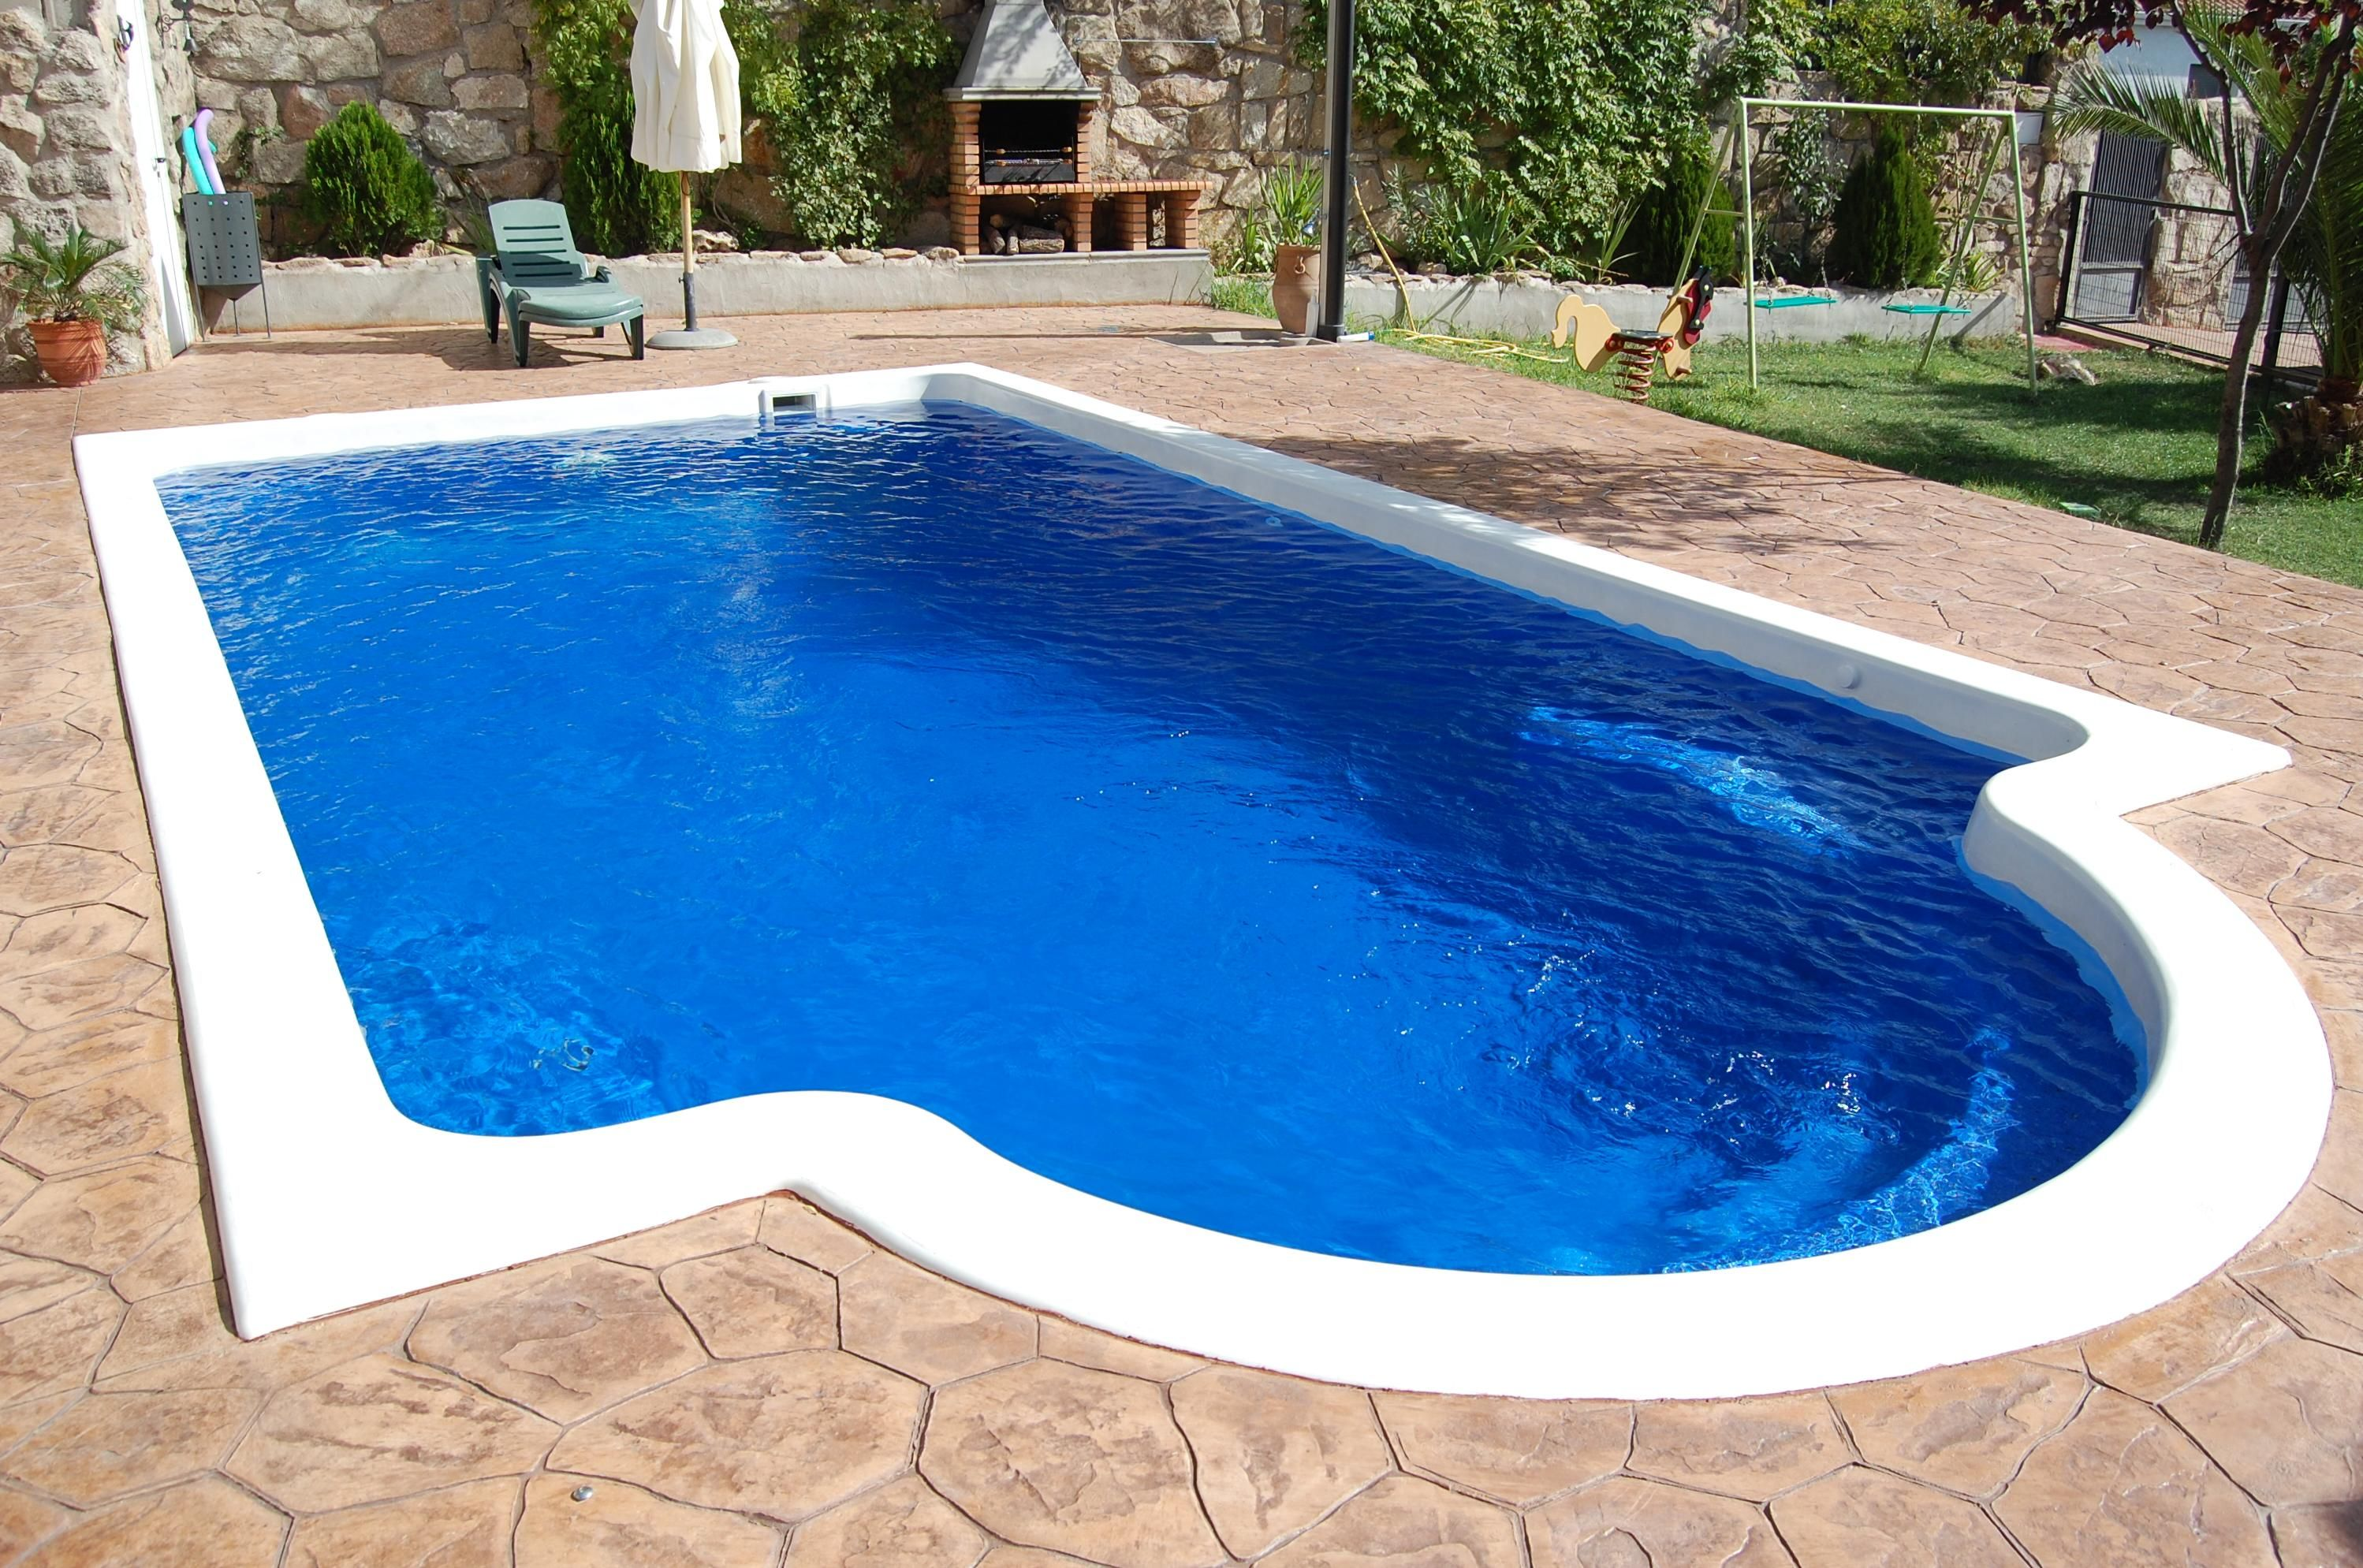 piscina grecian de 8.18 x 4.15 prof. 1.0-1.7 con tumbona de